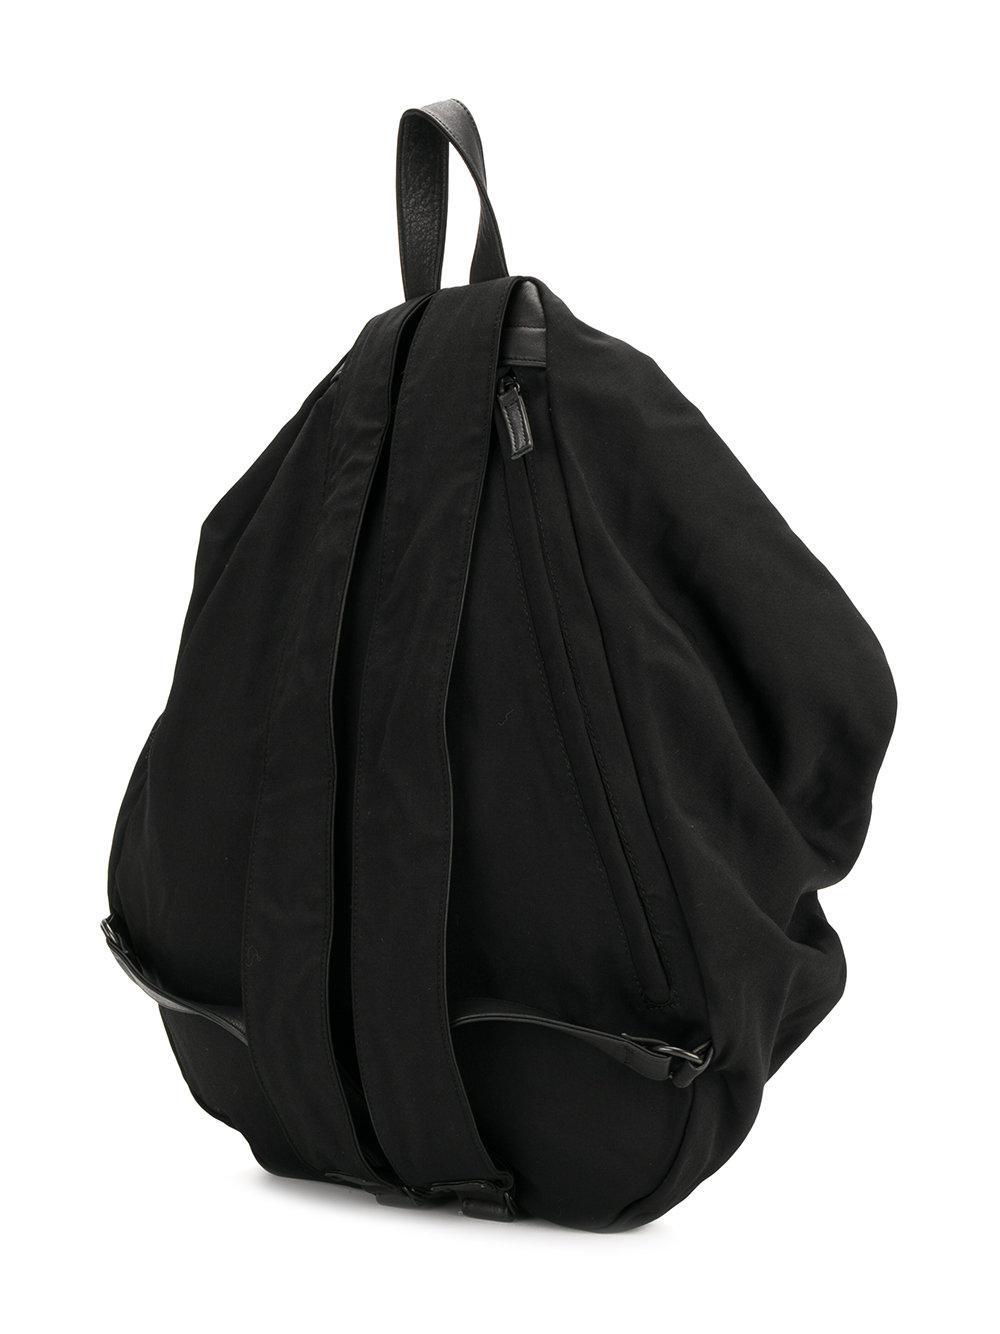 Yohji Yamamoto Drawstring Draped Backpack in Black for Men - Lyst 2ebee0e8fa